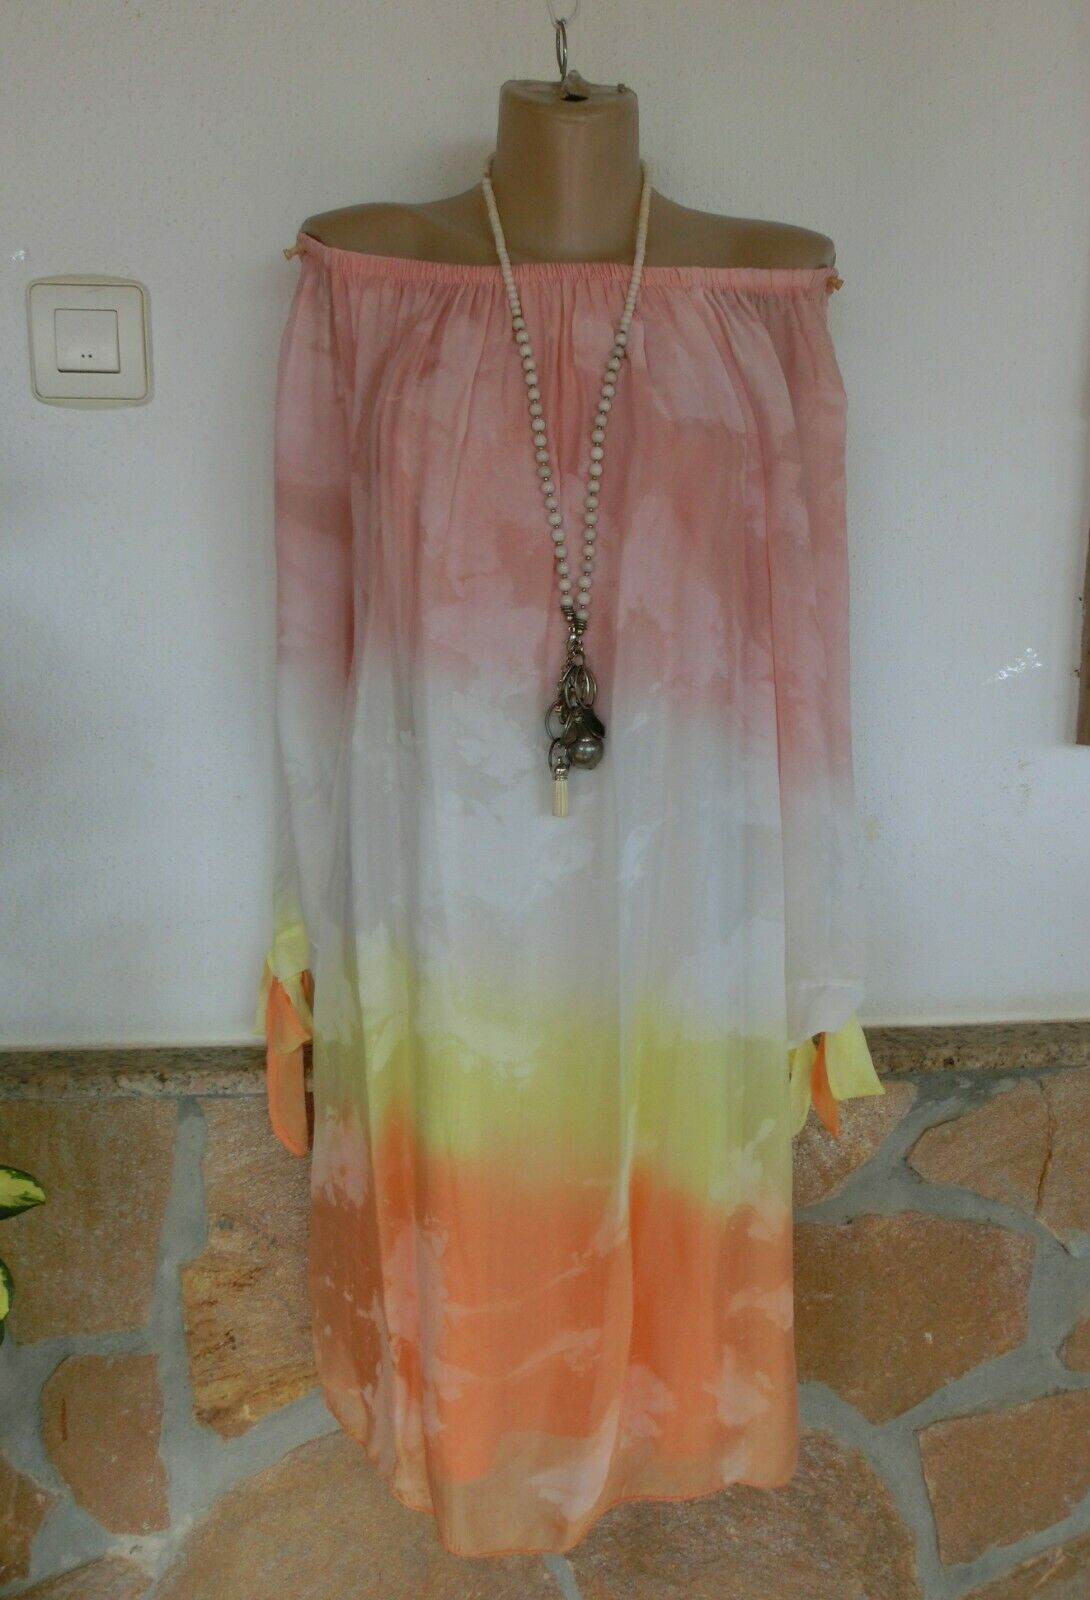 Kleid Hängerchen Elisa Romantik SEIDE BeInn Farbmix 4 Farbig  EG 38-42